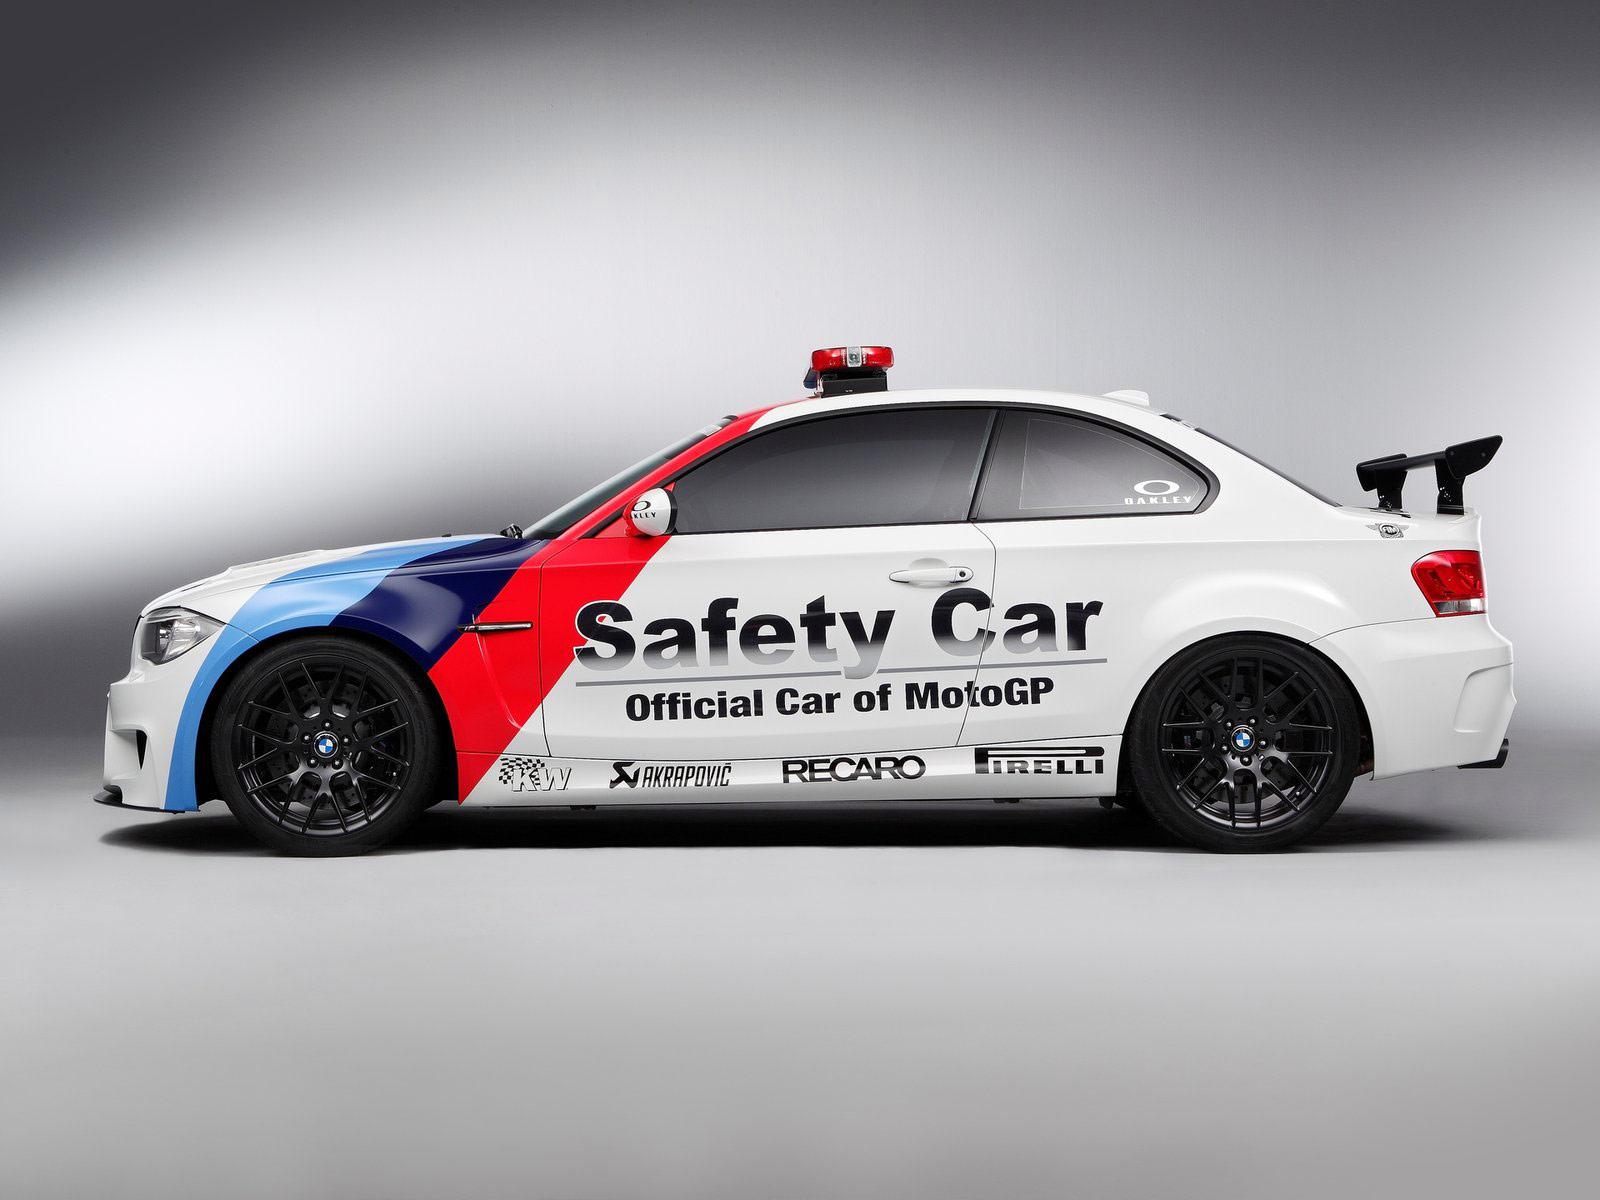 Bmw 1 Series M Coupe Motogp Safety Car